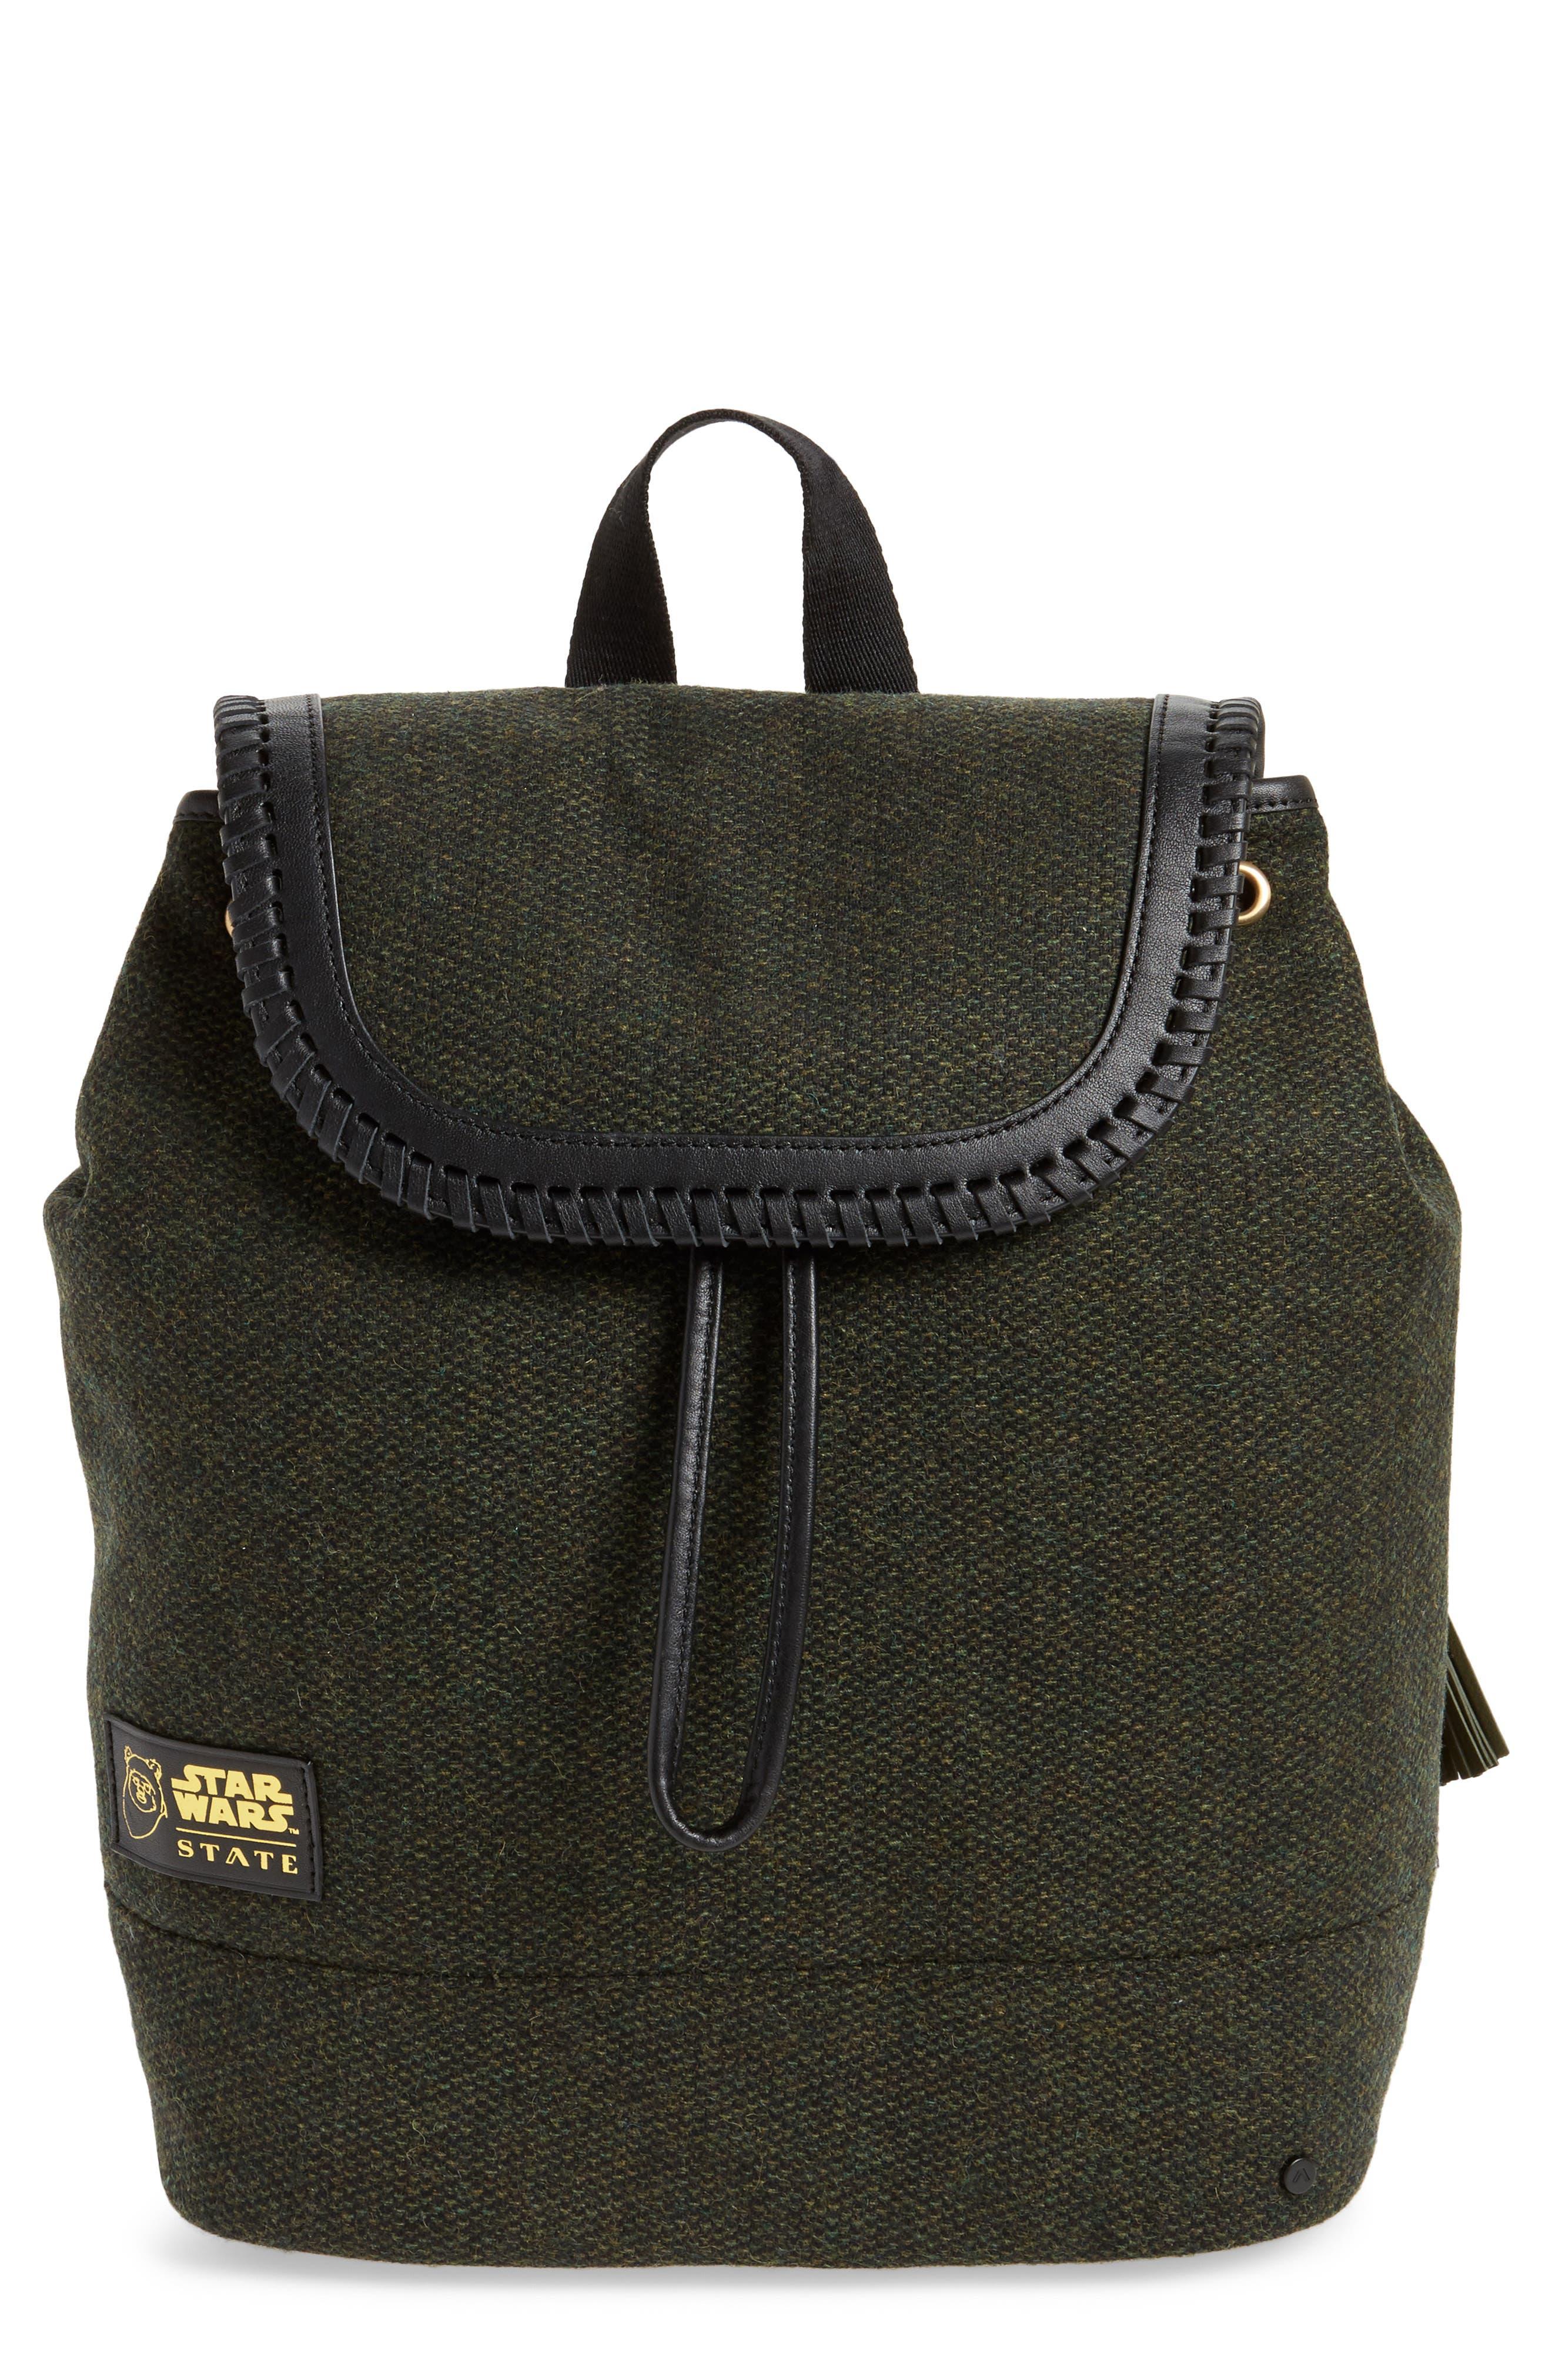 Main Image - STATE Bags Star Wars - The Ewoks Hattie Backpack